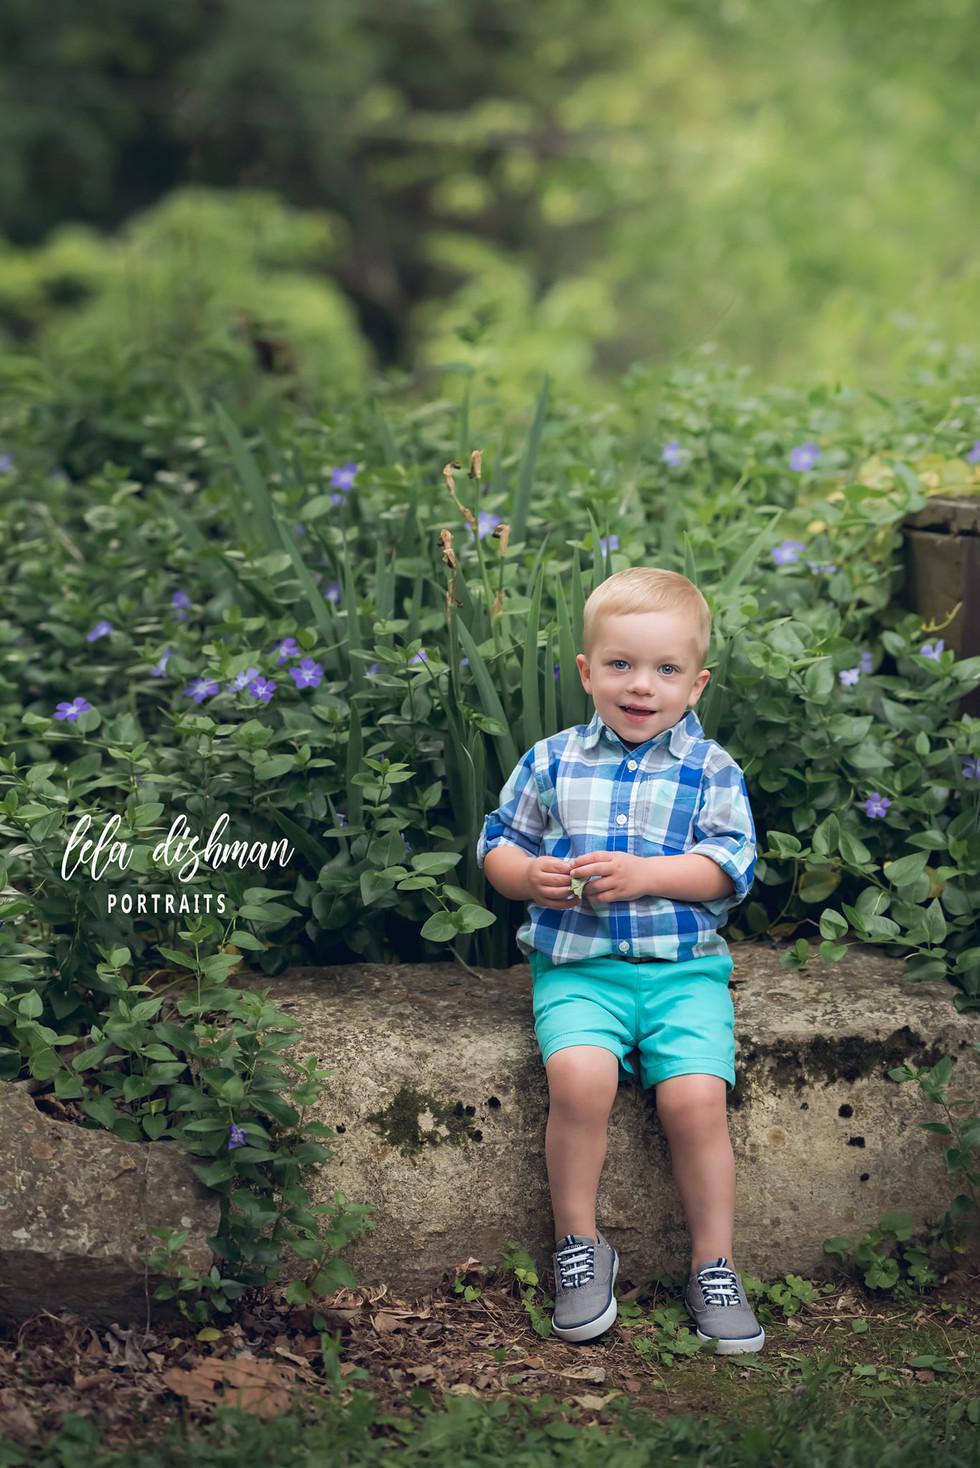 Children's Photography Monticello, Somerset Kentucky and surrounding areas- Lela Dishman Portraits